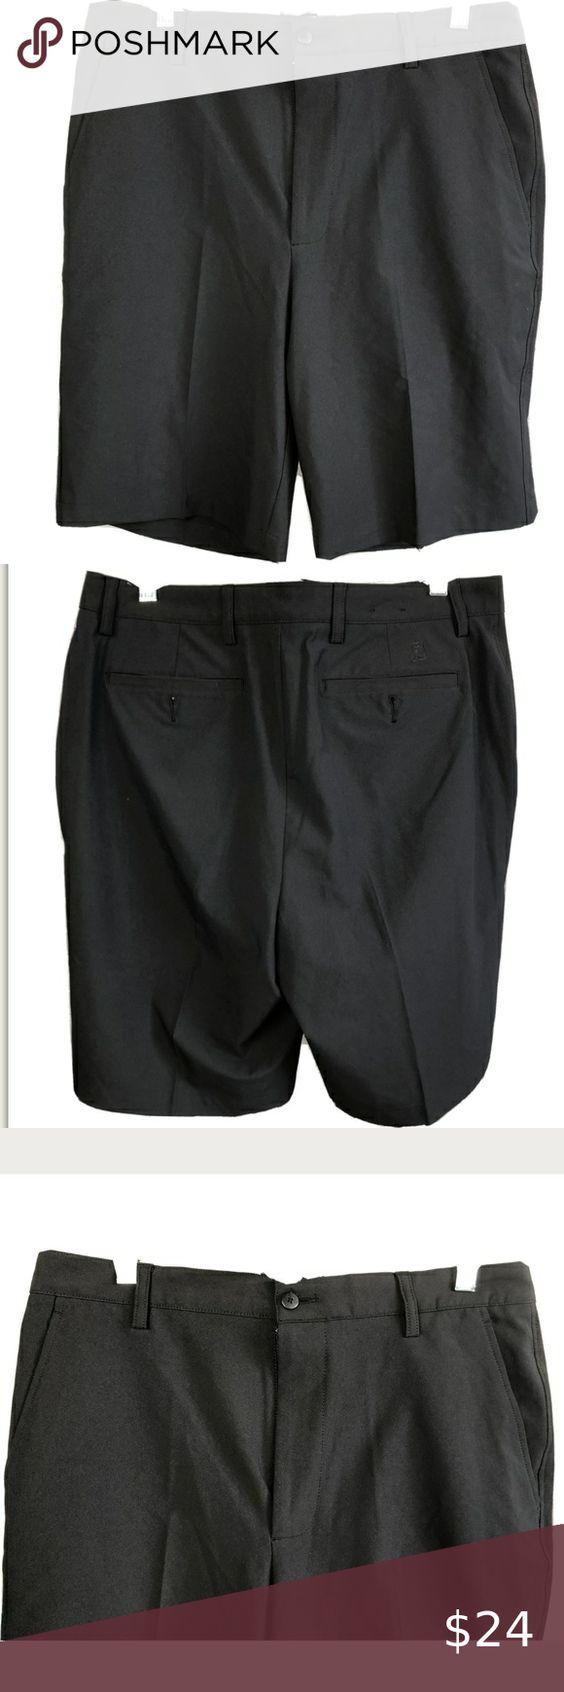 33+ Architect golf shorts information